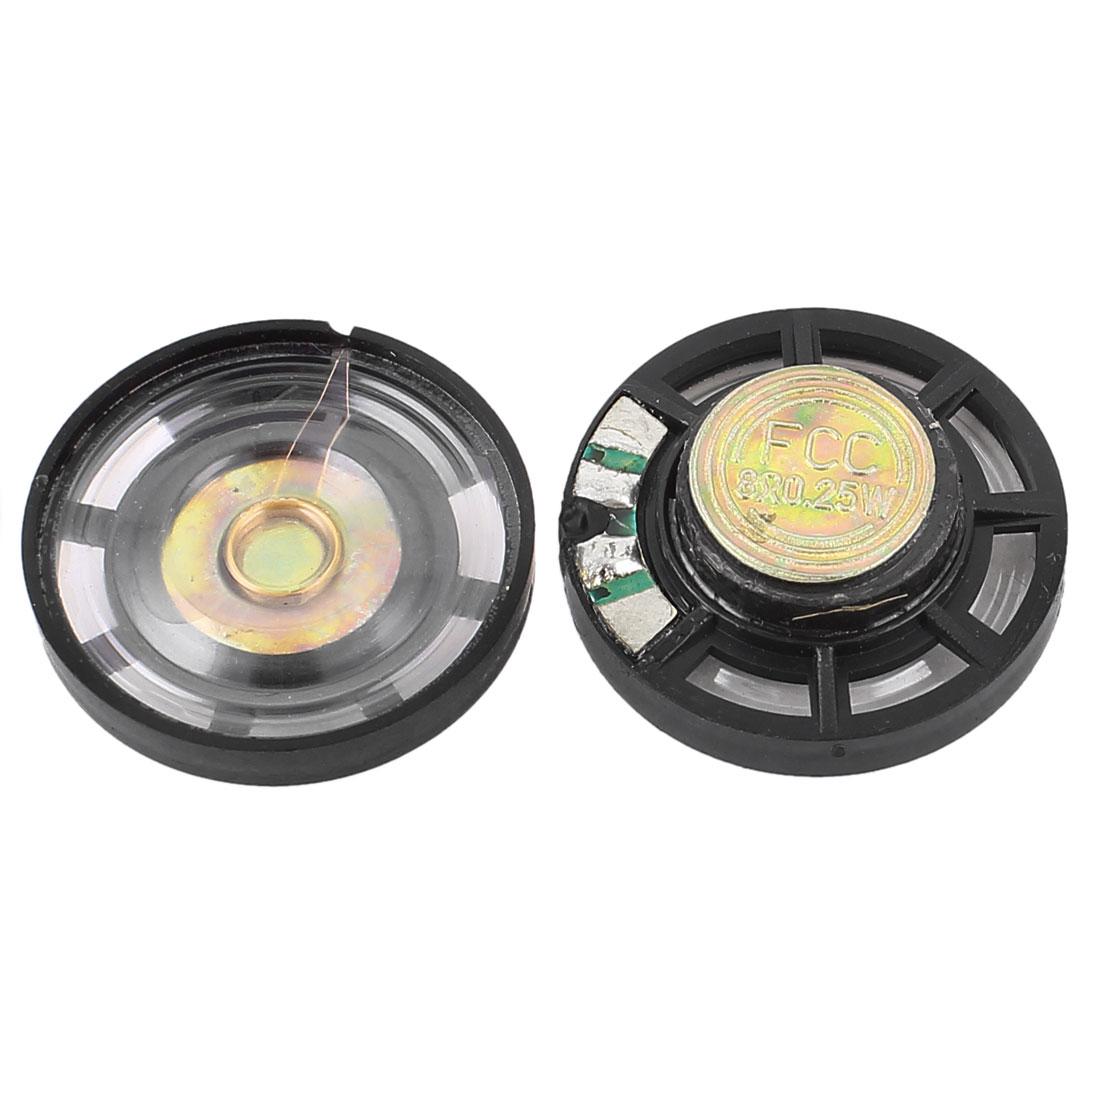 2pcs 0.25W 8 Ohm 29mm Dia Round External Magnetic Magnet Electronic Speaker Loudspeaker